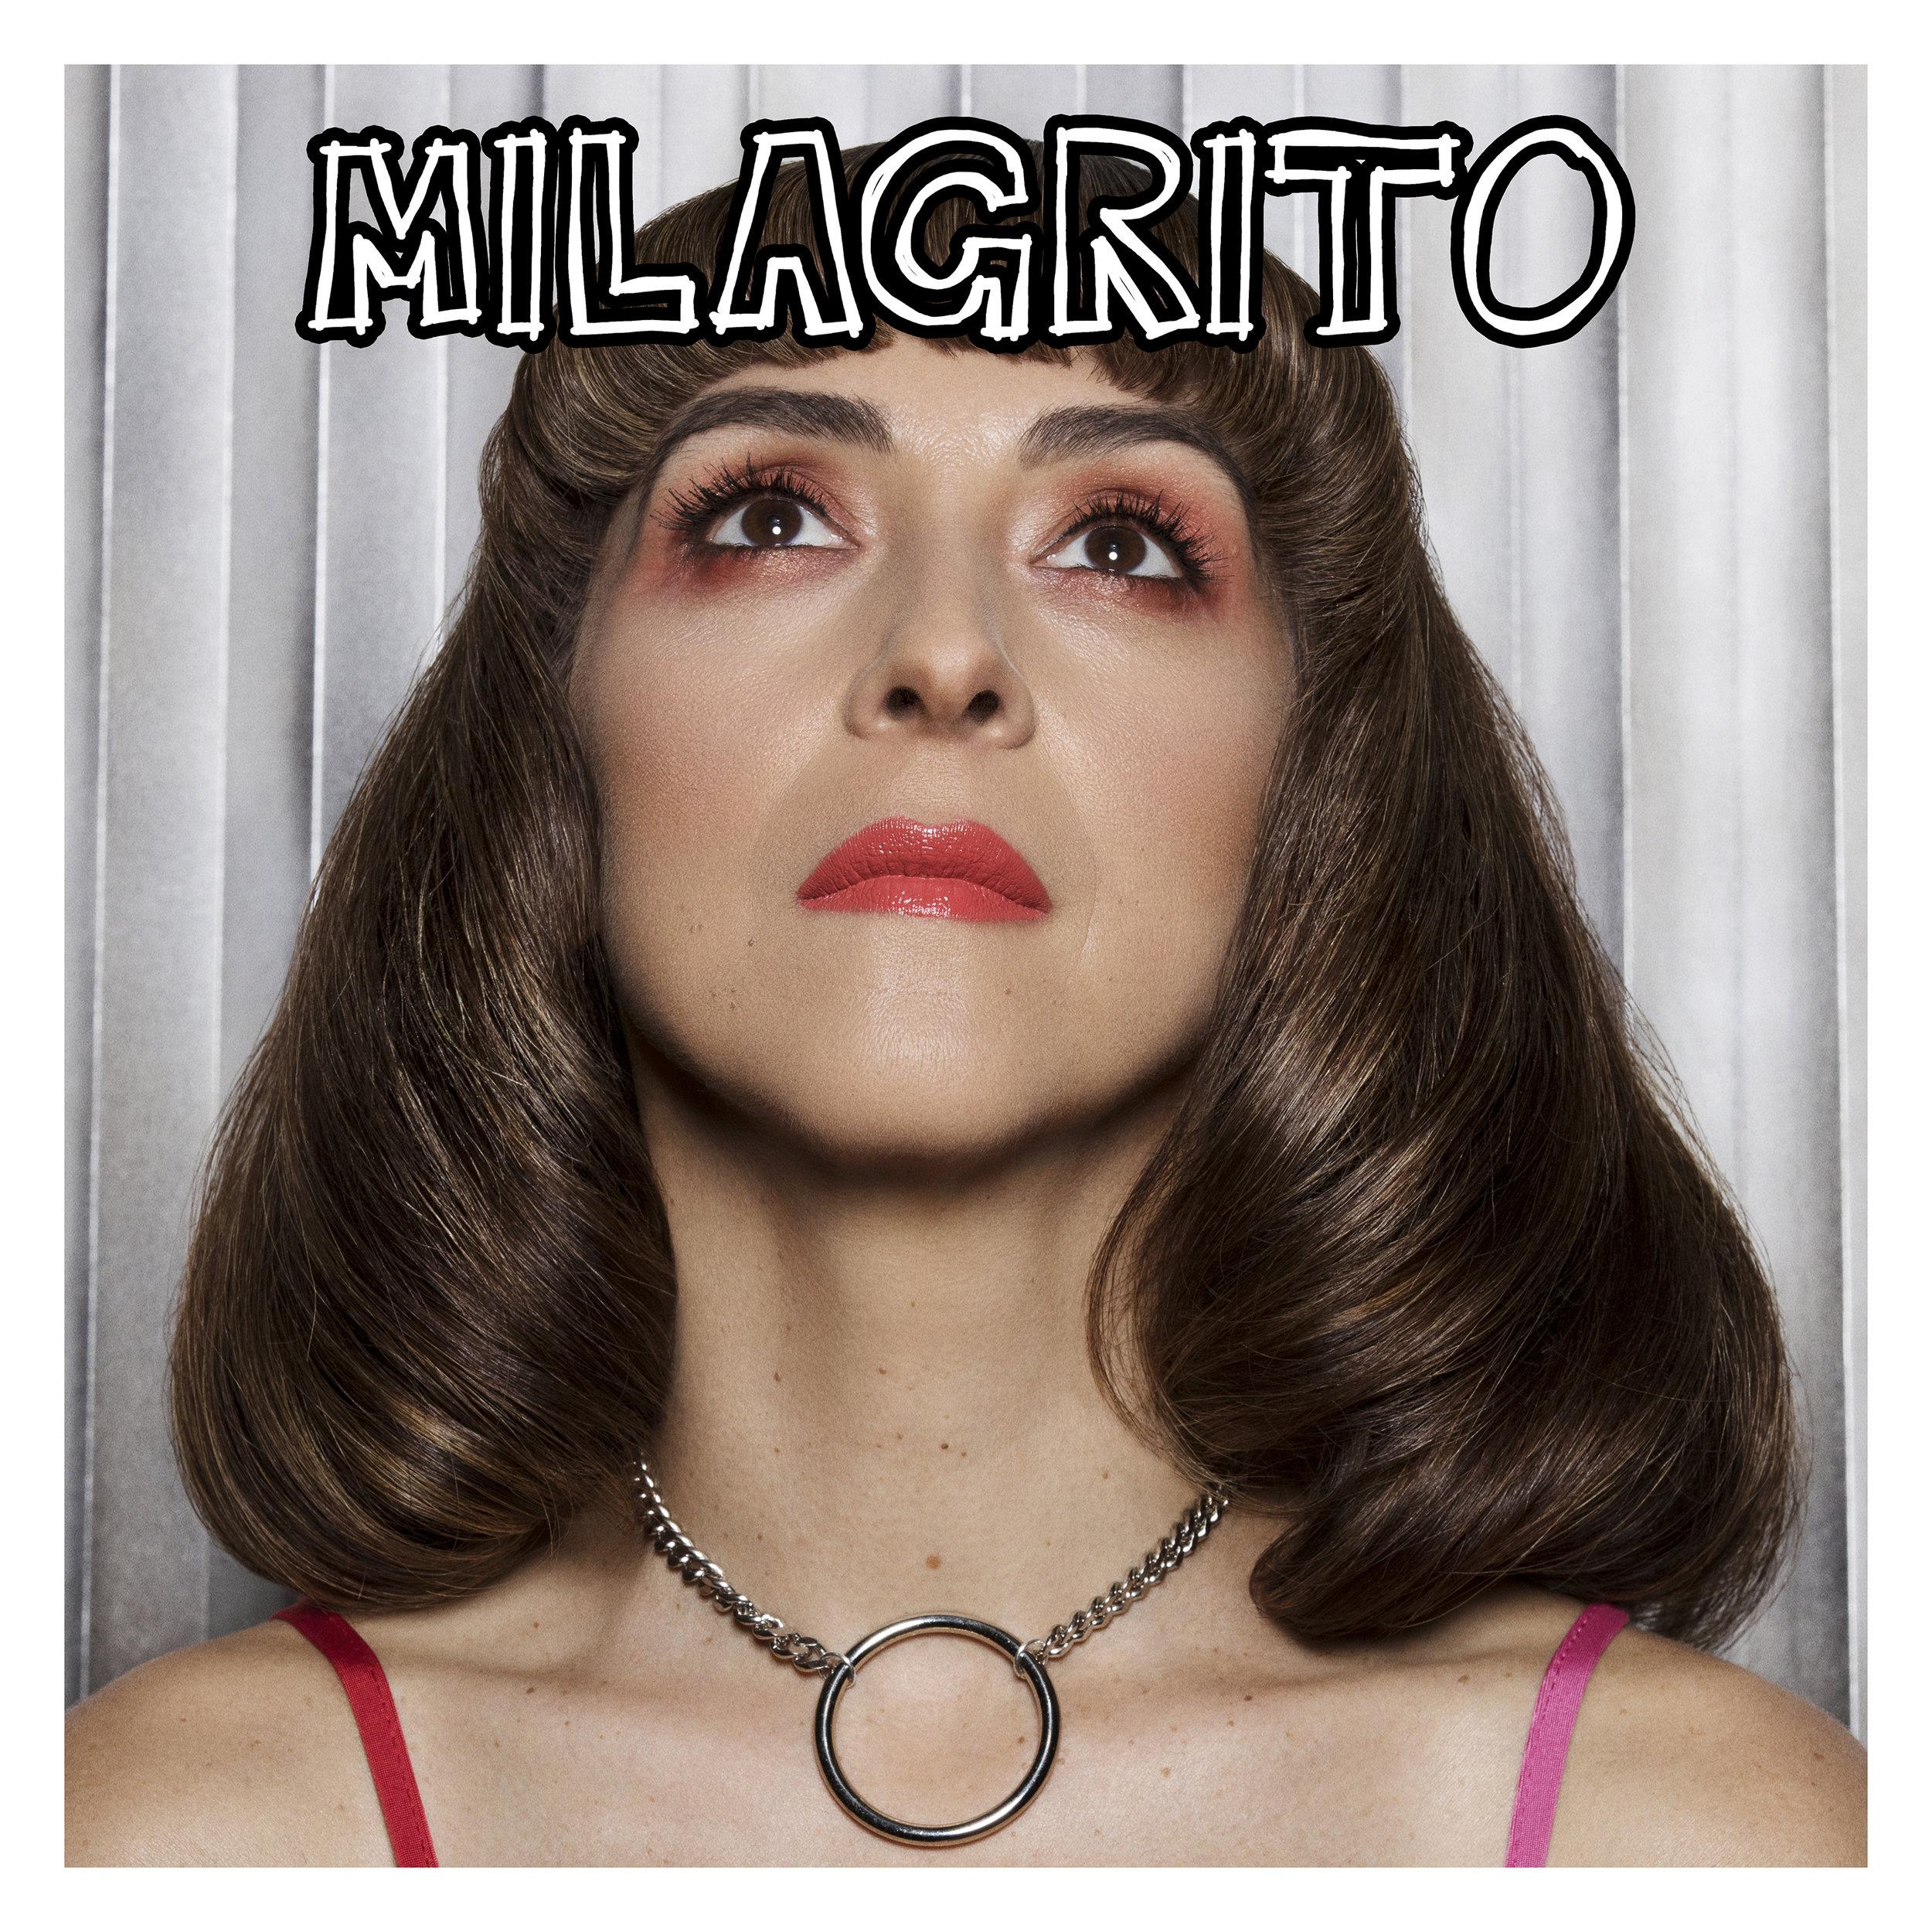 Milagrito Single cover 3000x3000.jpg